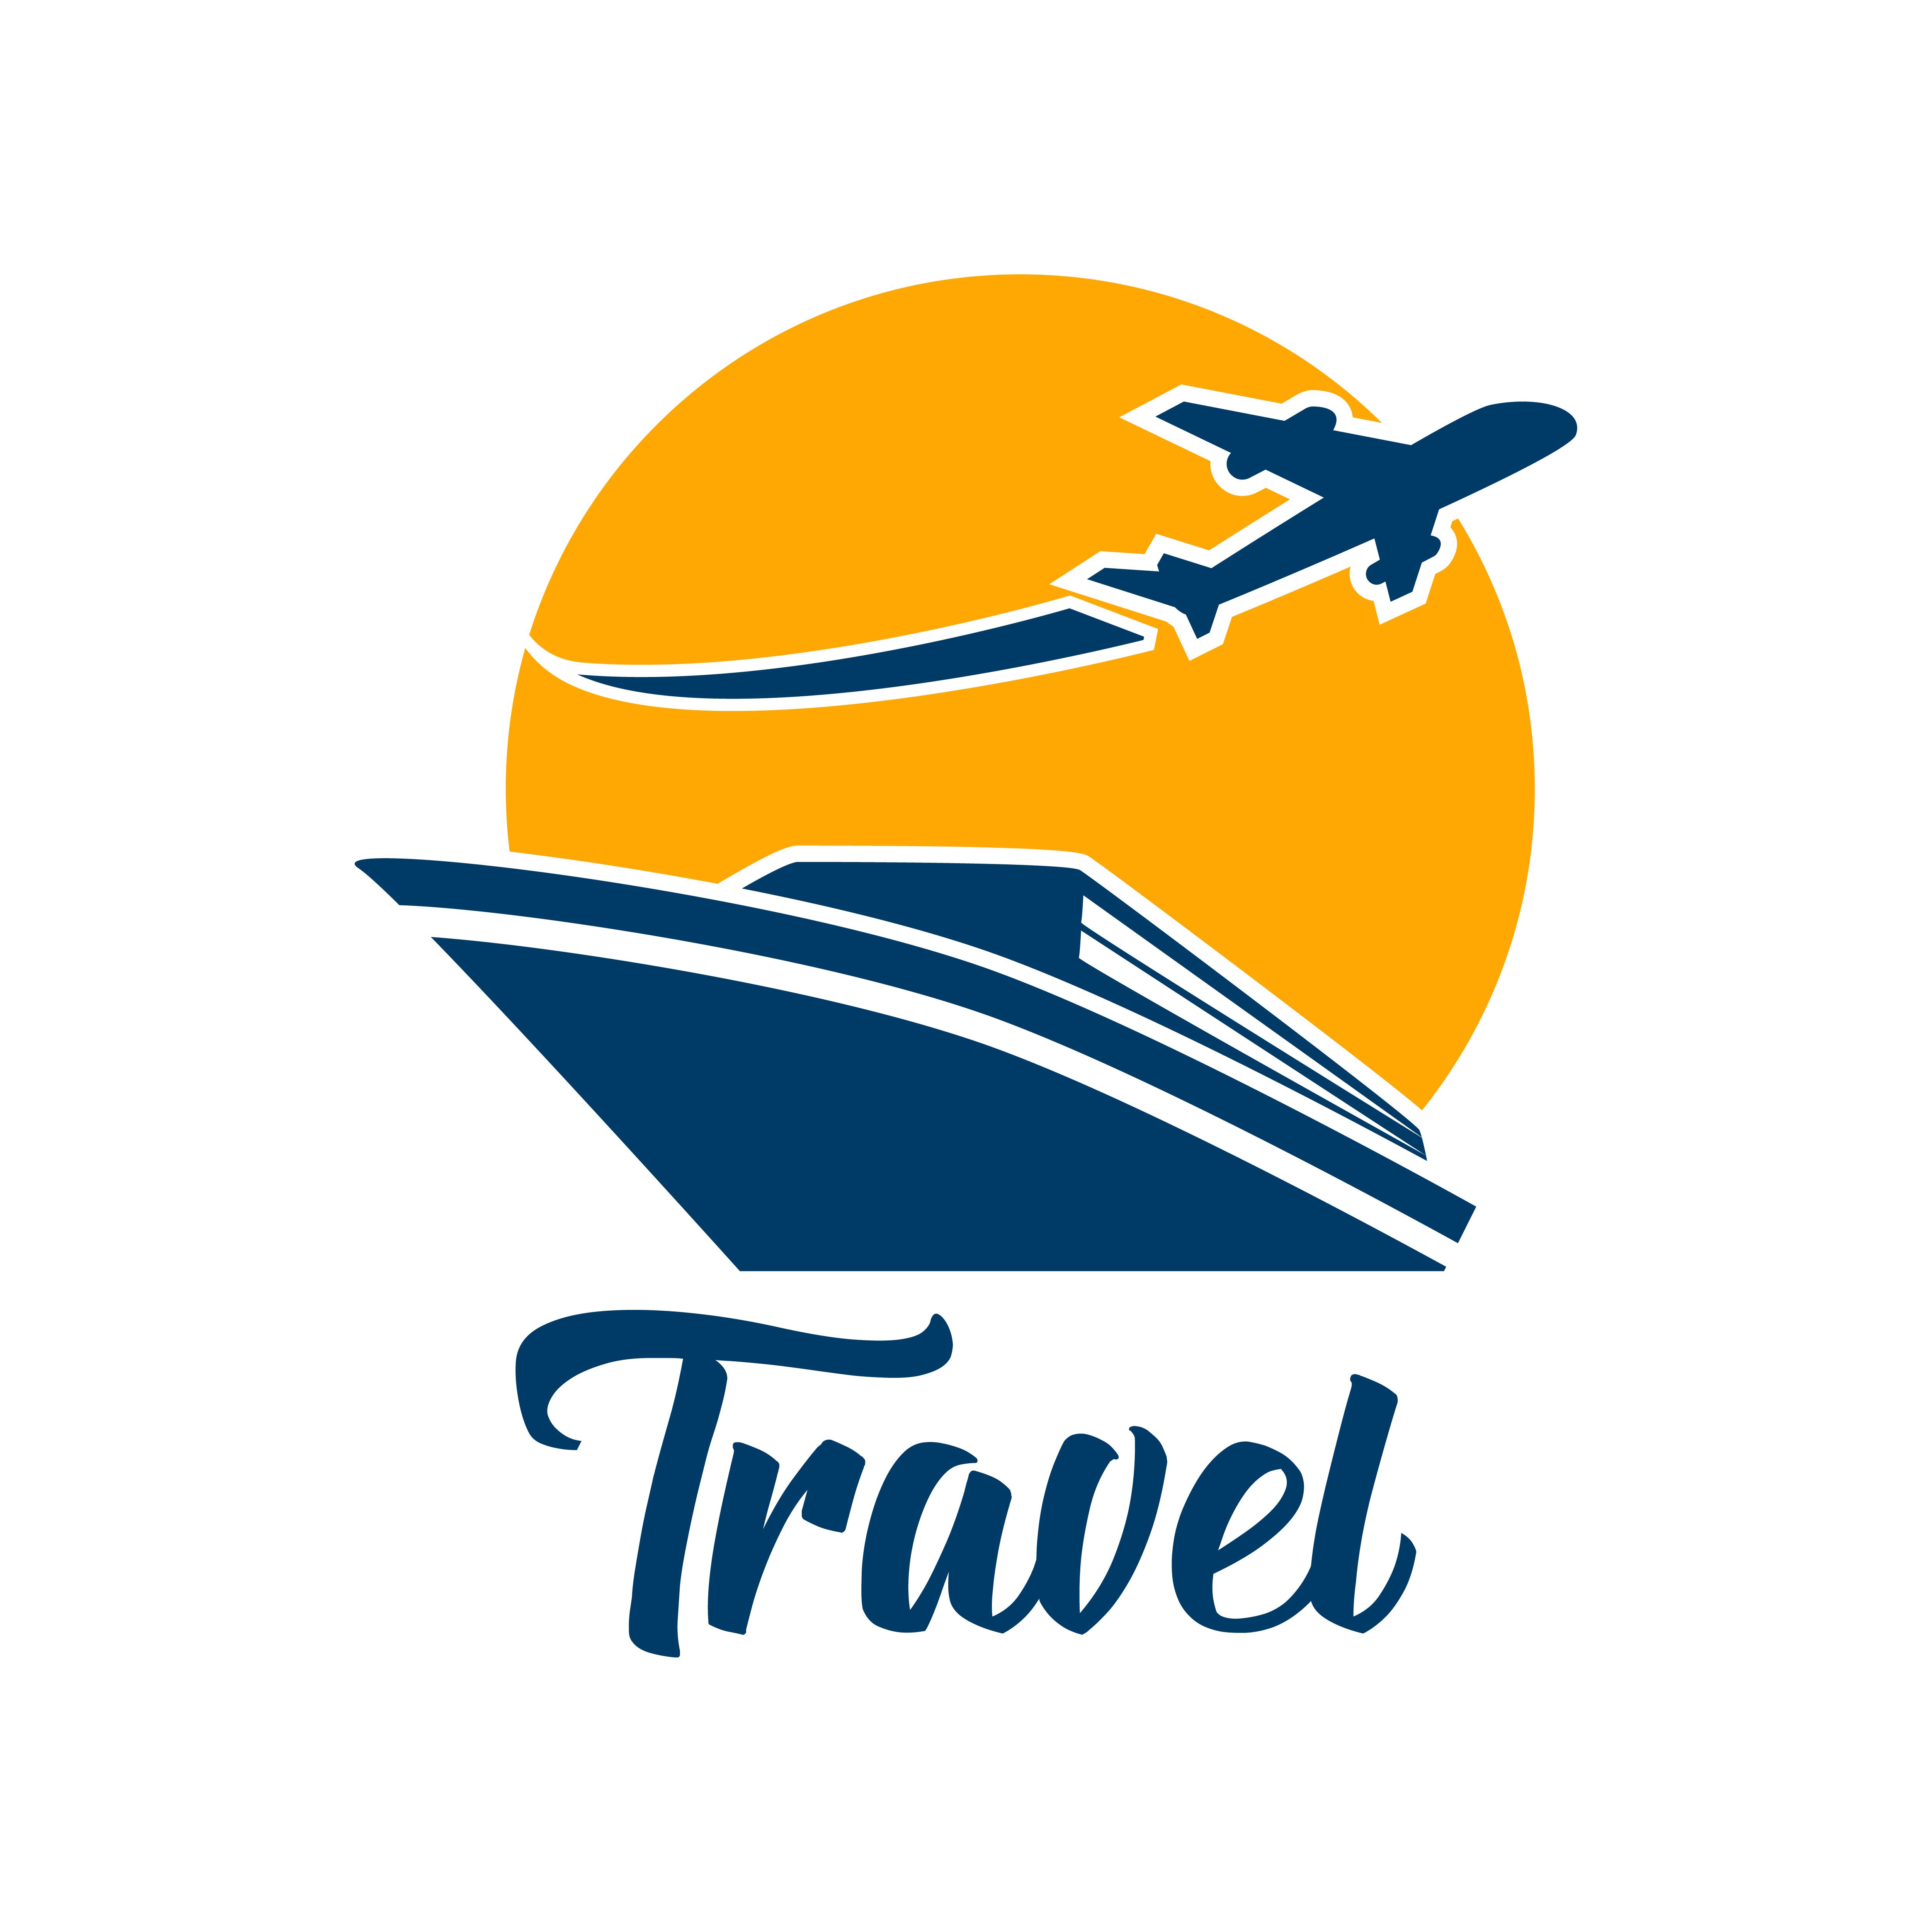 Travel Logo Free Vector Art - (43,978 Free Downloads)